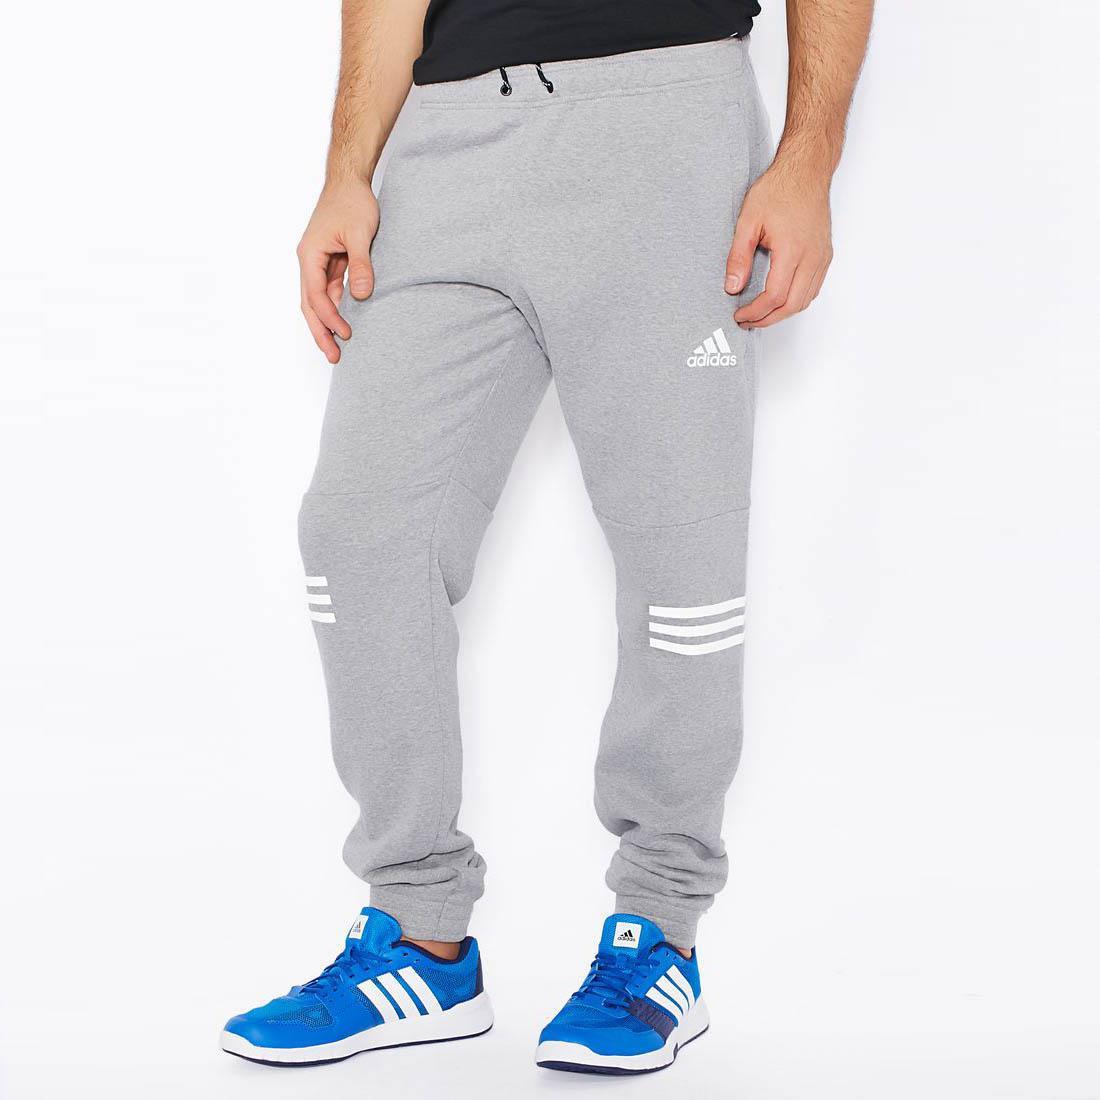 Adidas Mens Lineage 3 Stripes Sweatpants Core Heather Grey